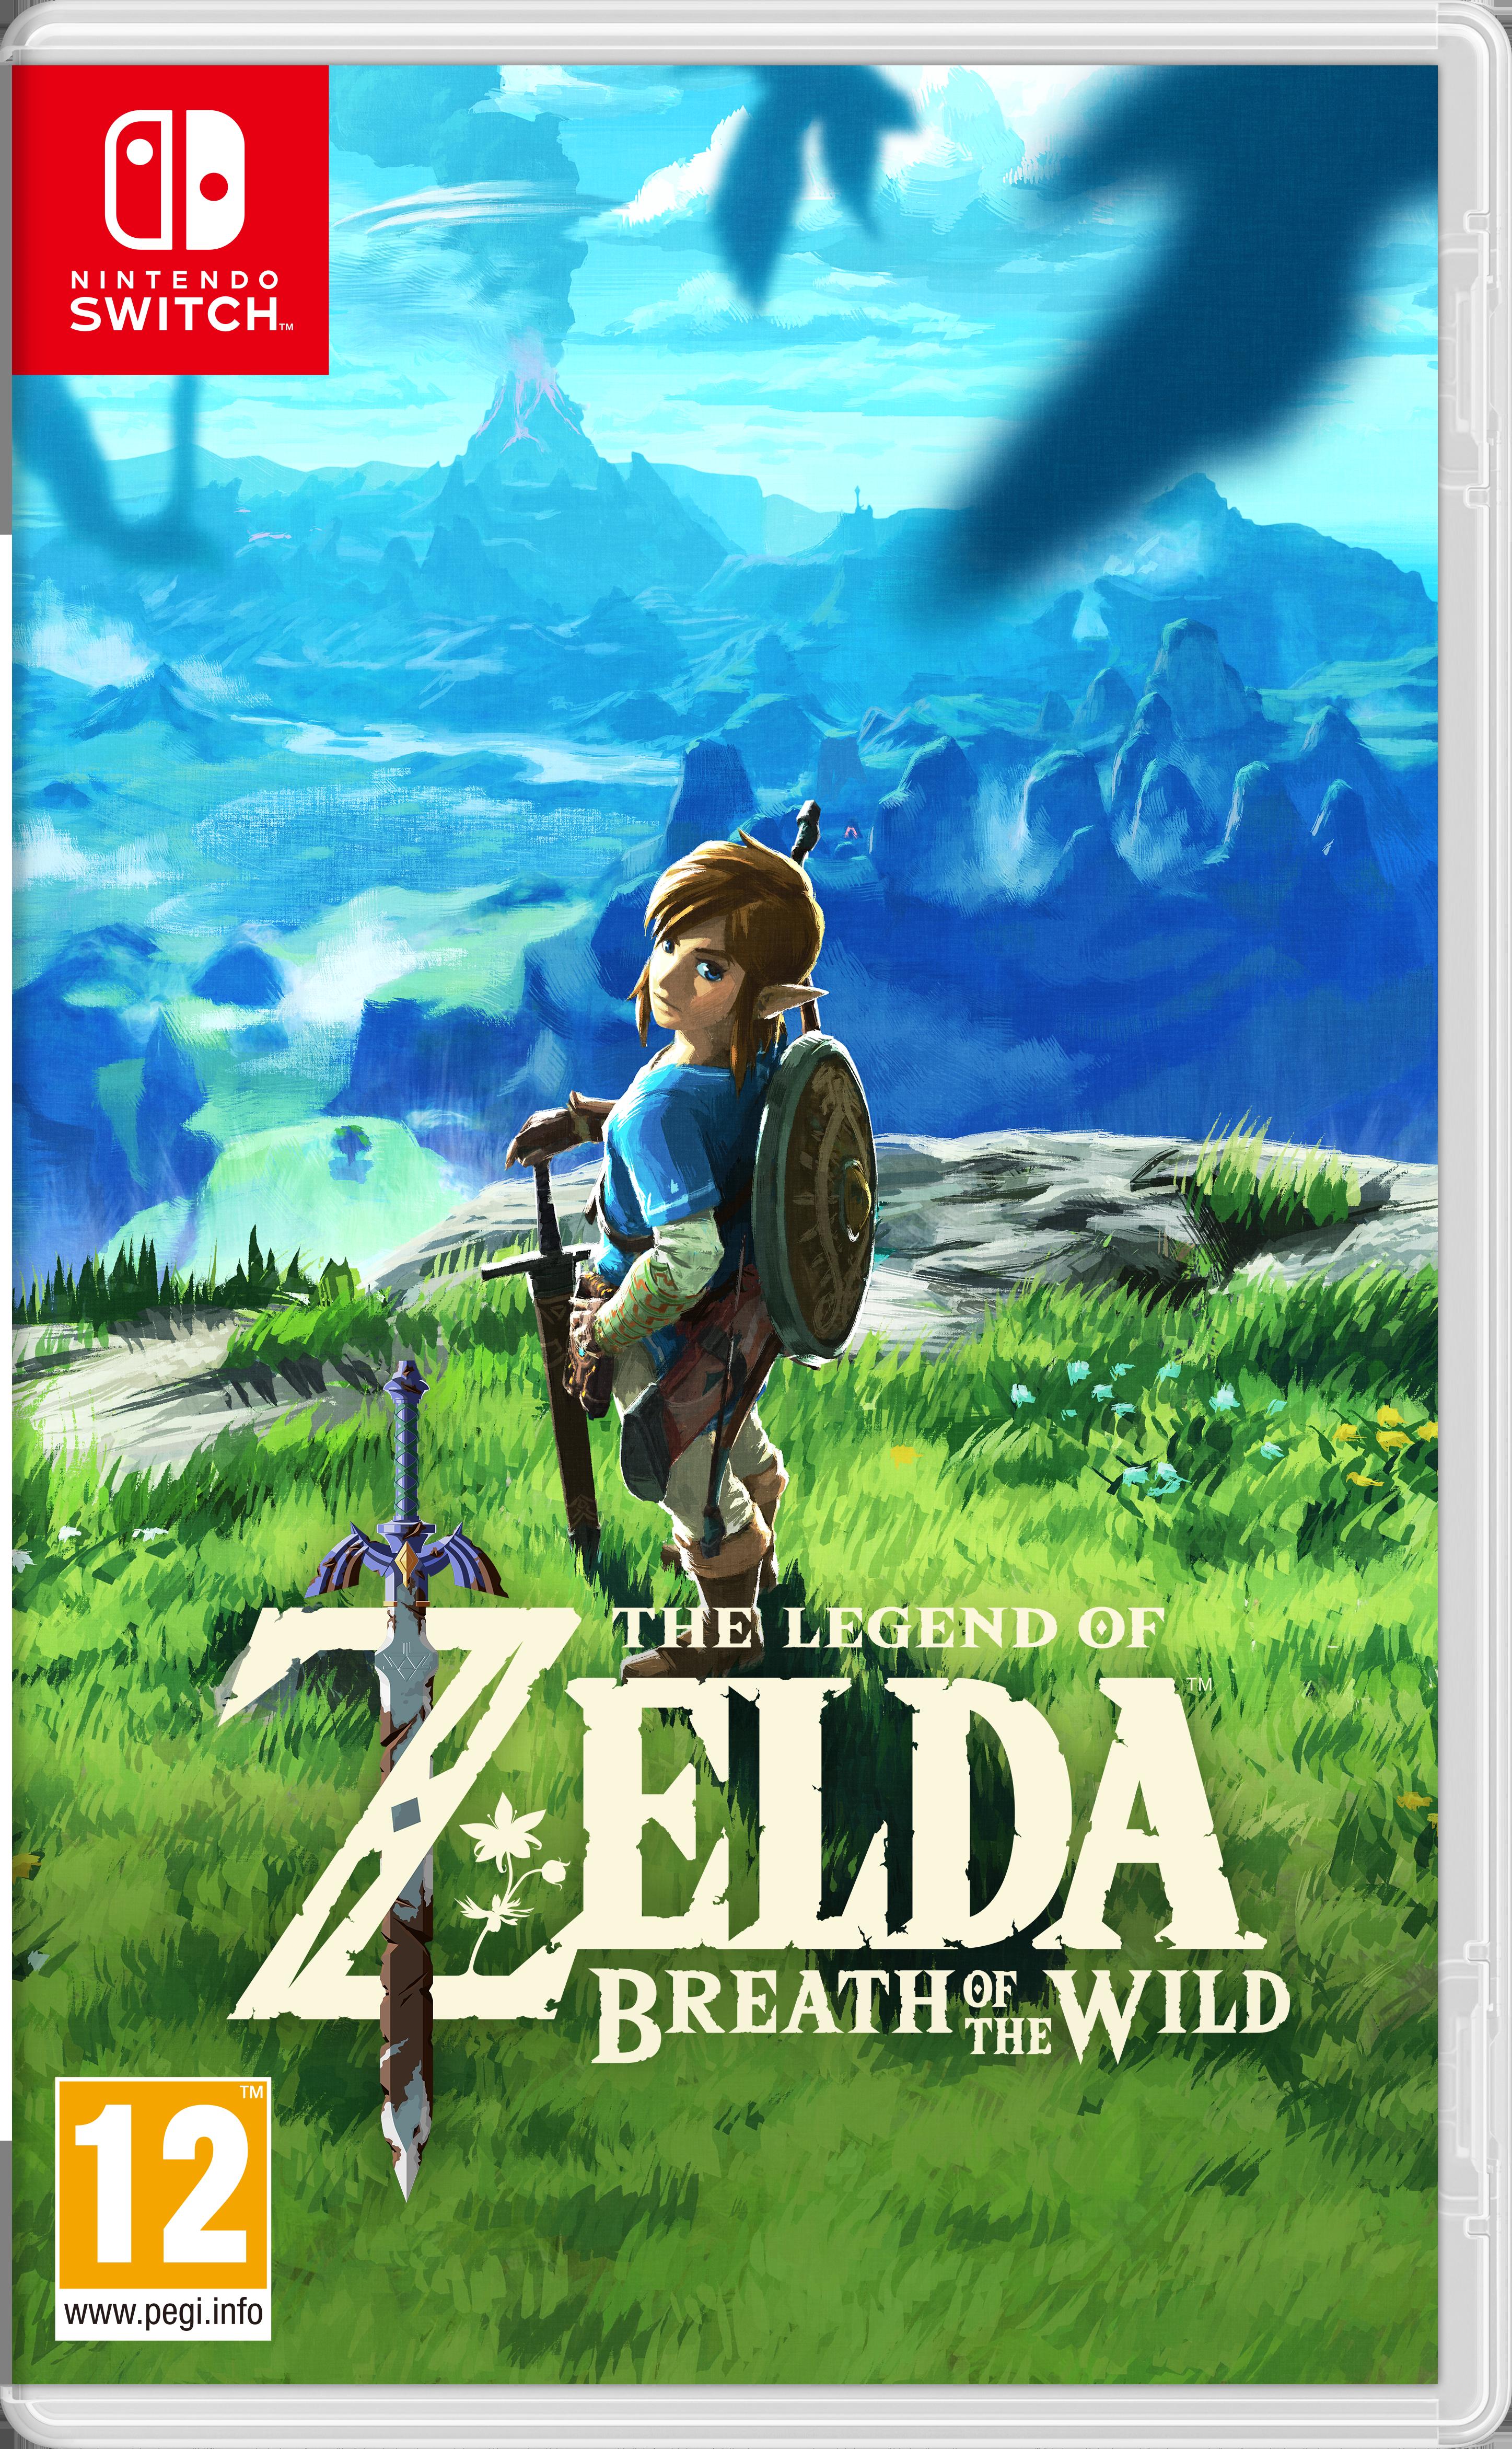 Le Test Du Jeu Video The Legend Of Zelda Breath Of The Wild